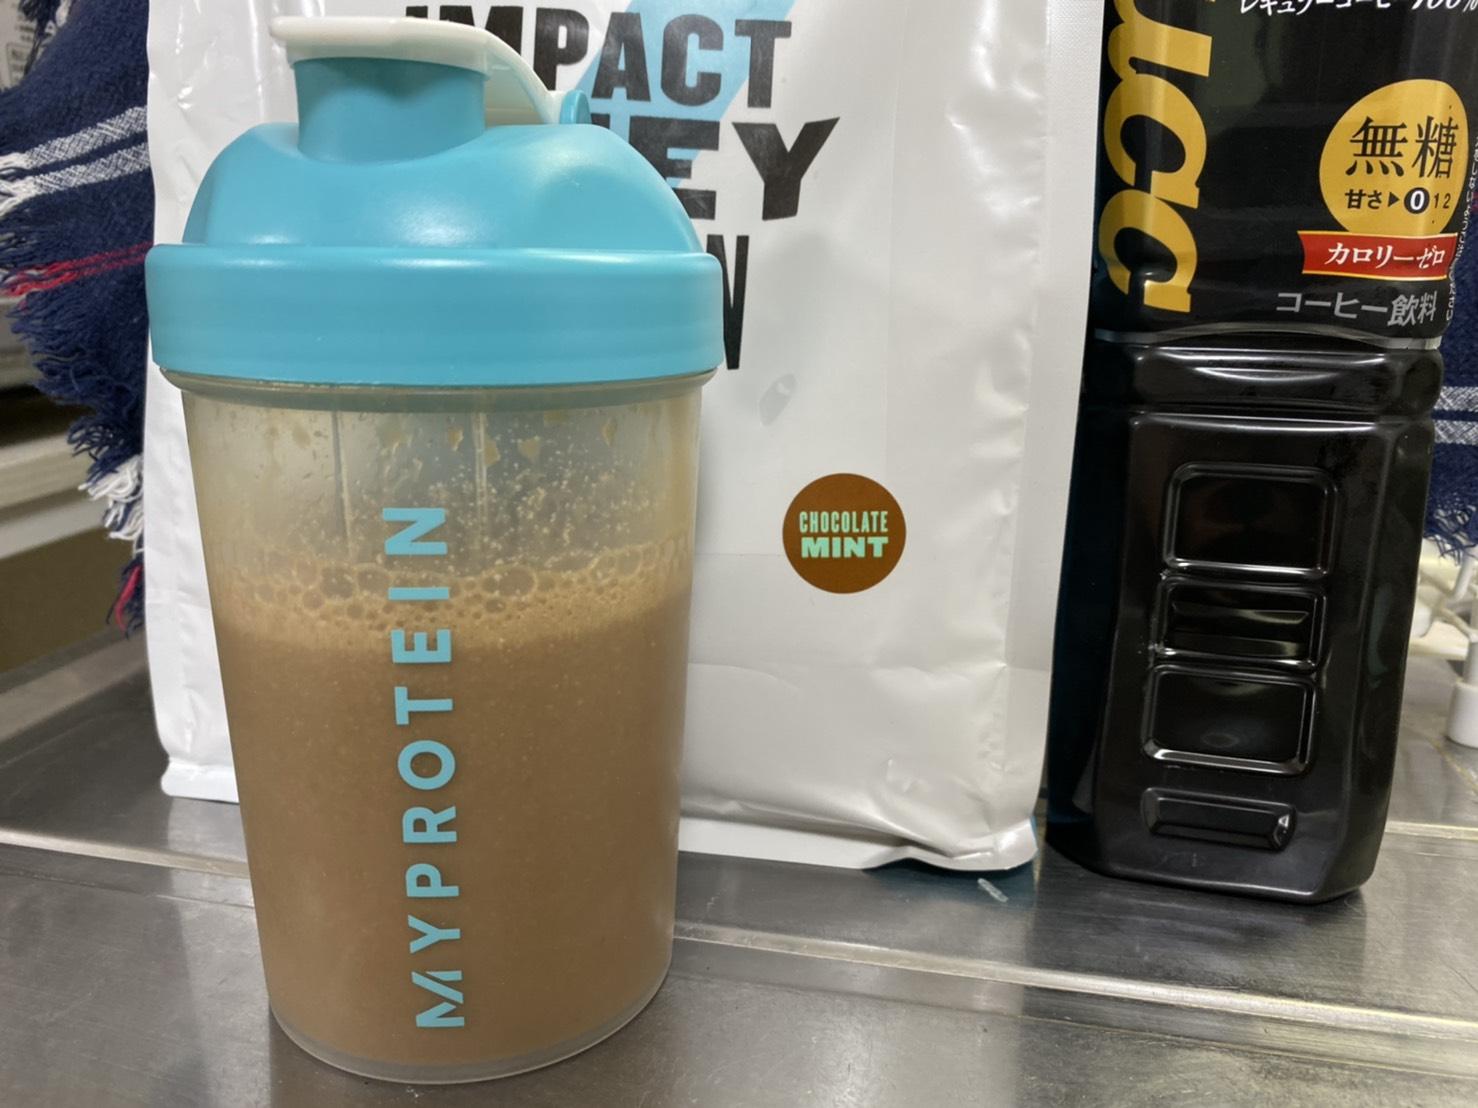 Impactホエイプロテイン:チョコミント味をアイスコーヒーで割る